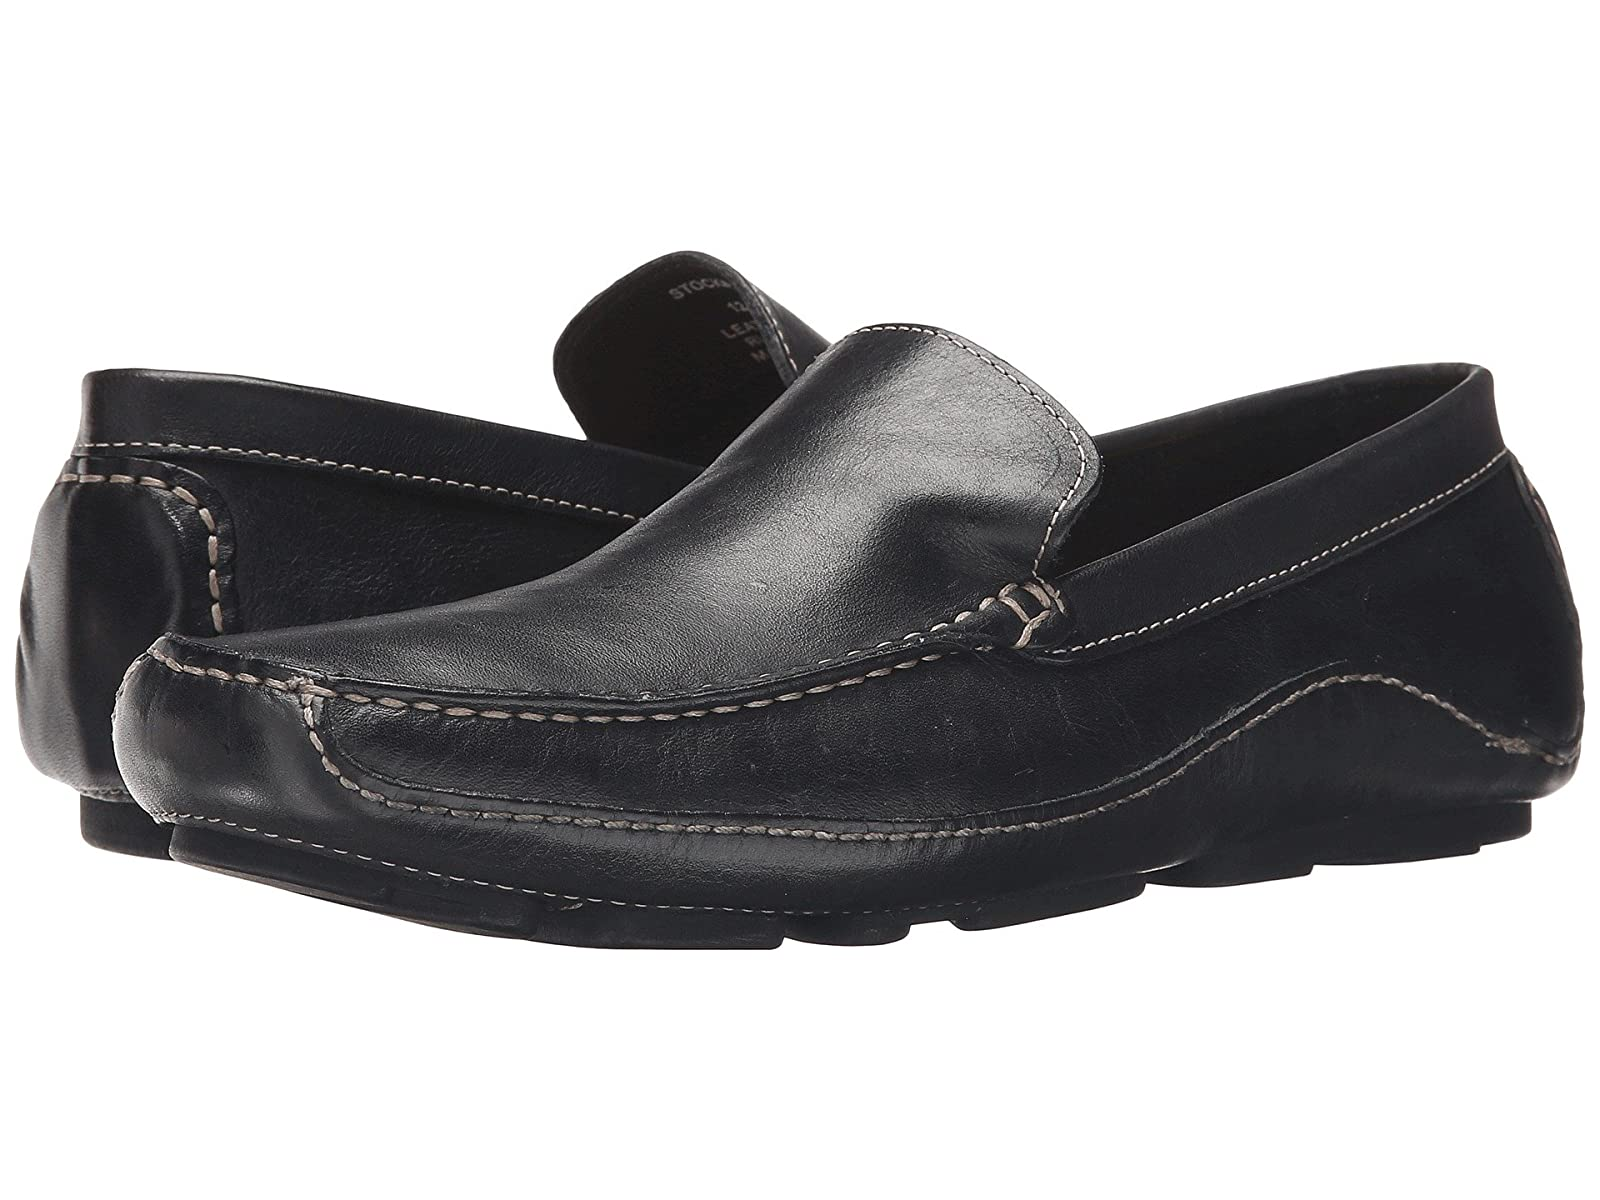 Gentlemen/Ladies:Giorgio Brutini product Trevor:Low price good product Brutini b03f15